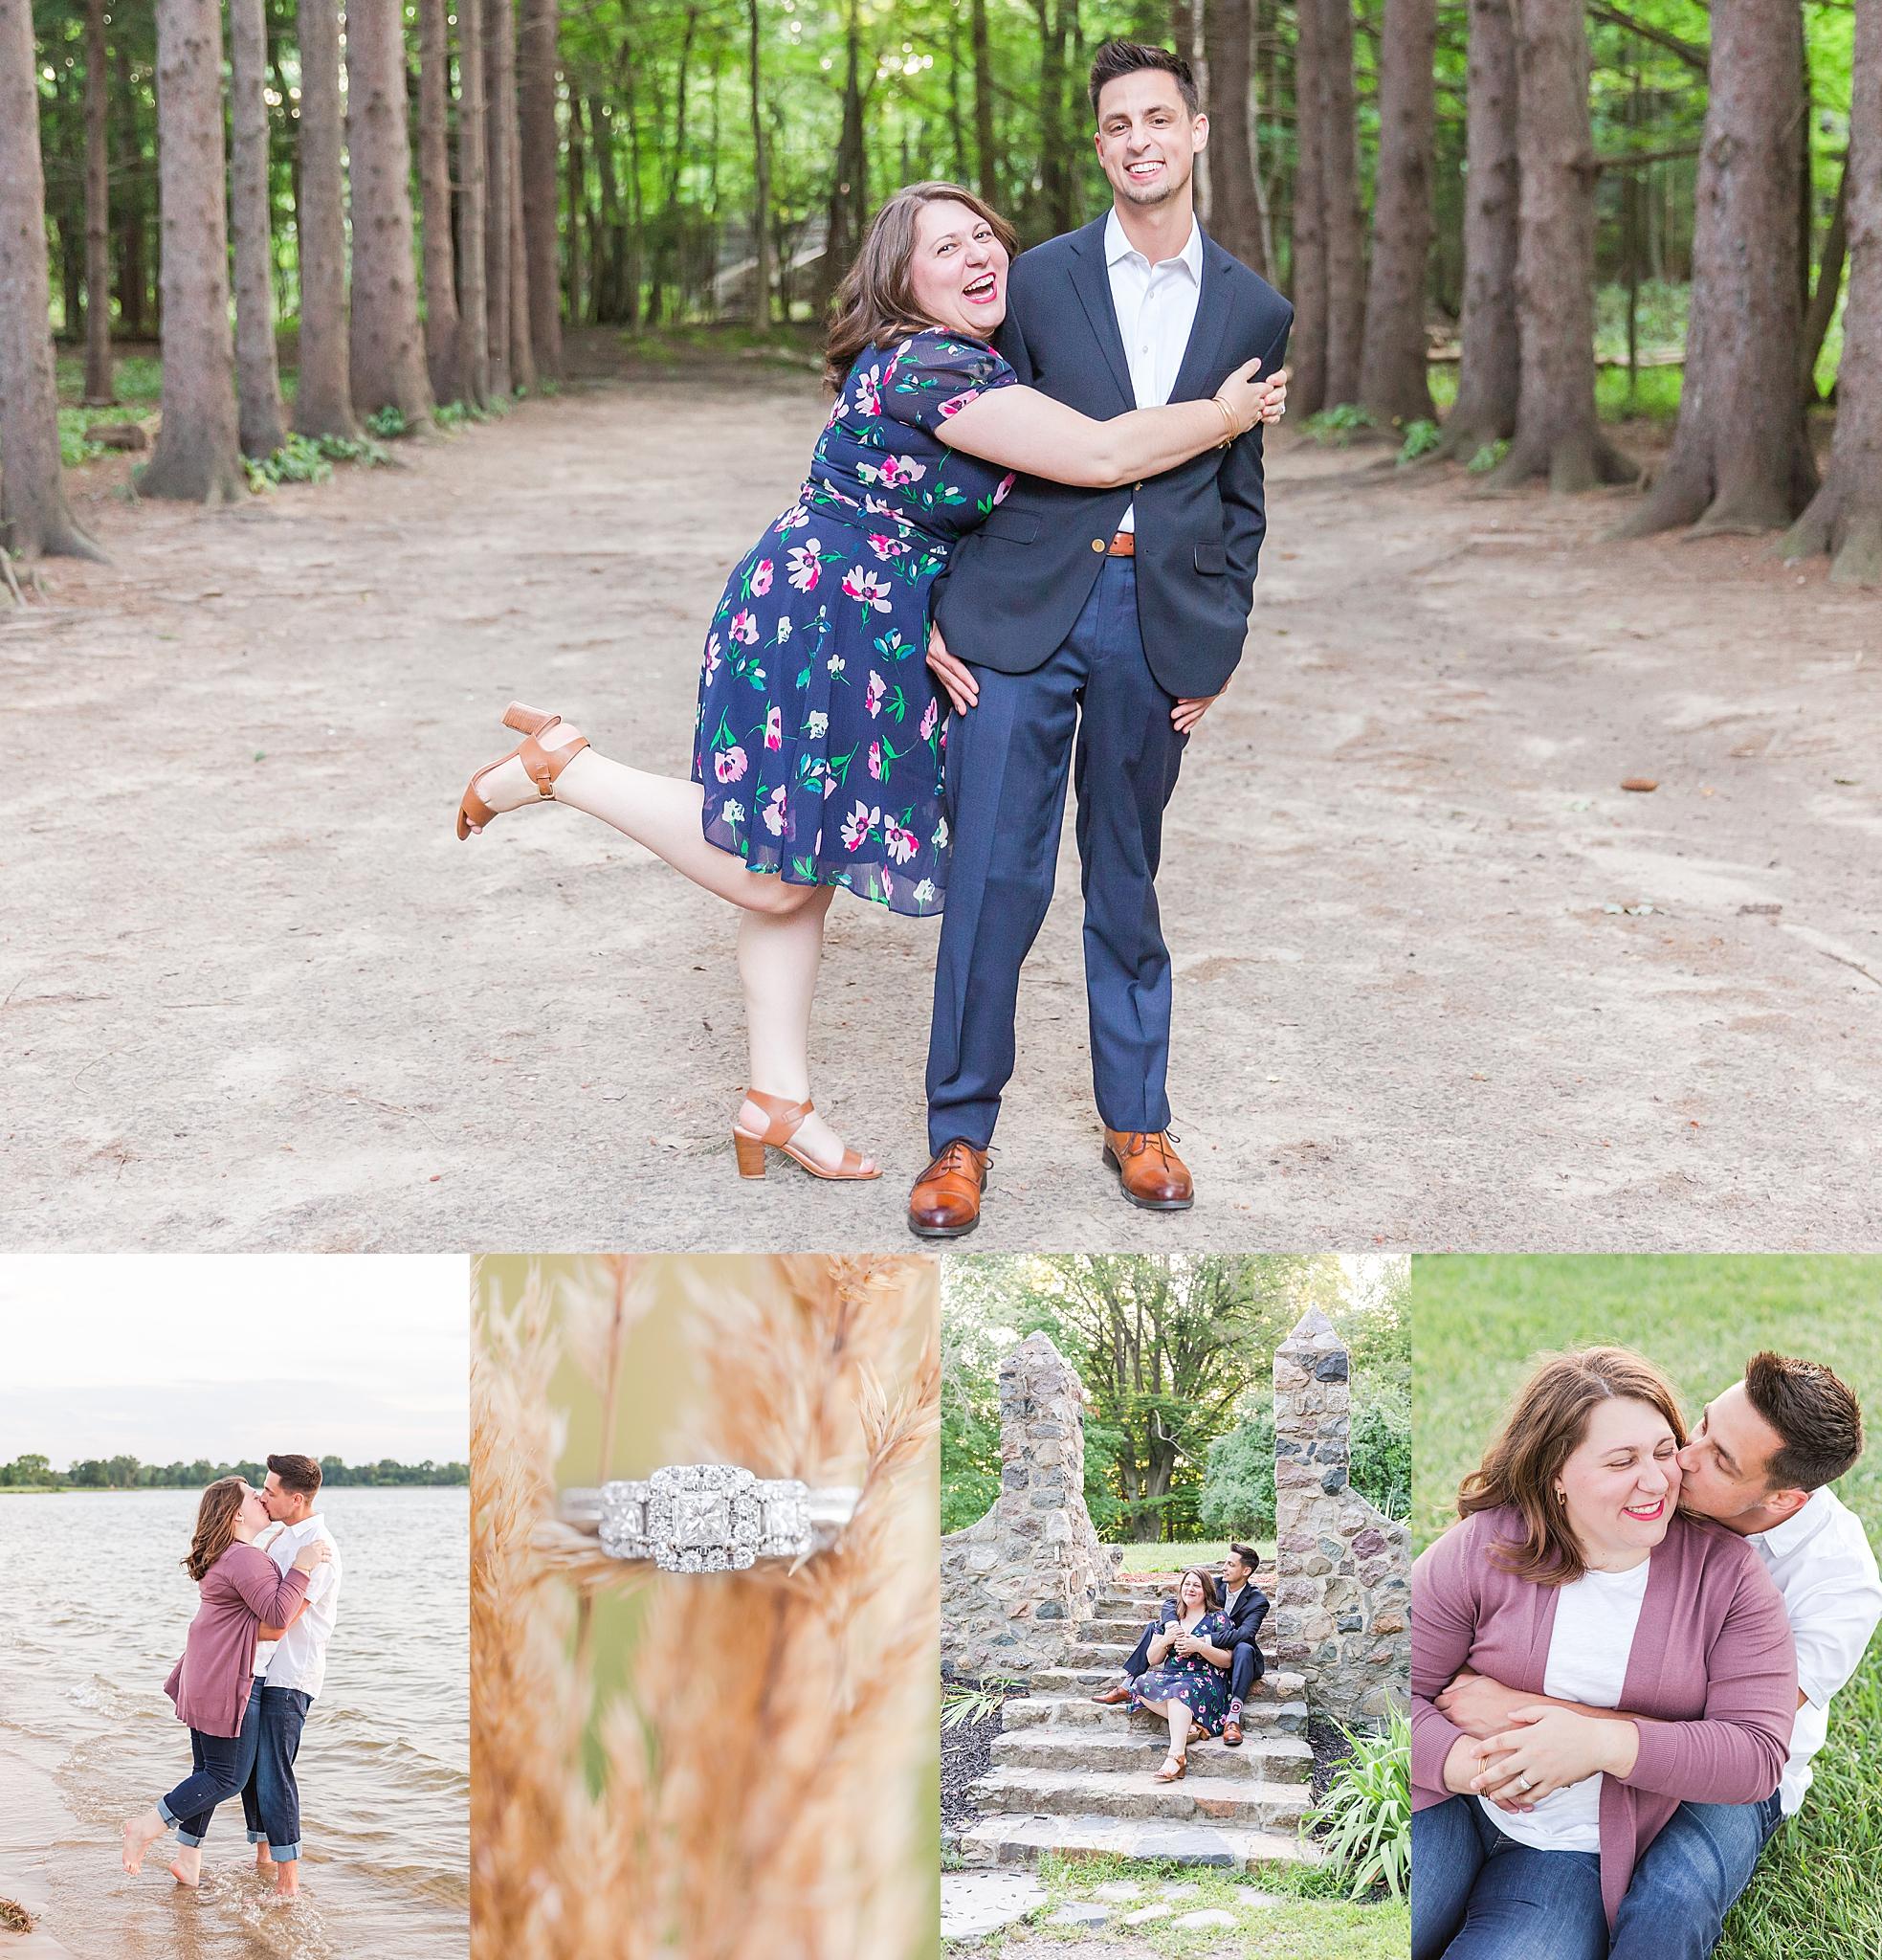 detroit-wedding-photographer-candid-engagement-photos-at-stony-creek-metropark-jackie-kyle-by-courtney-carolyn-photography_0044.jpg